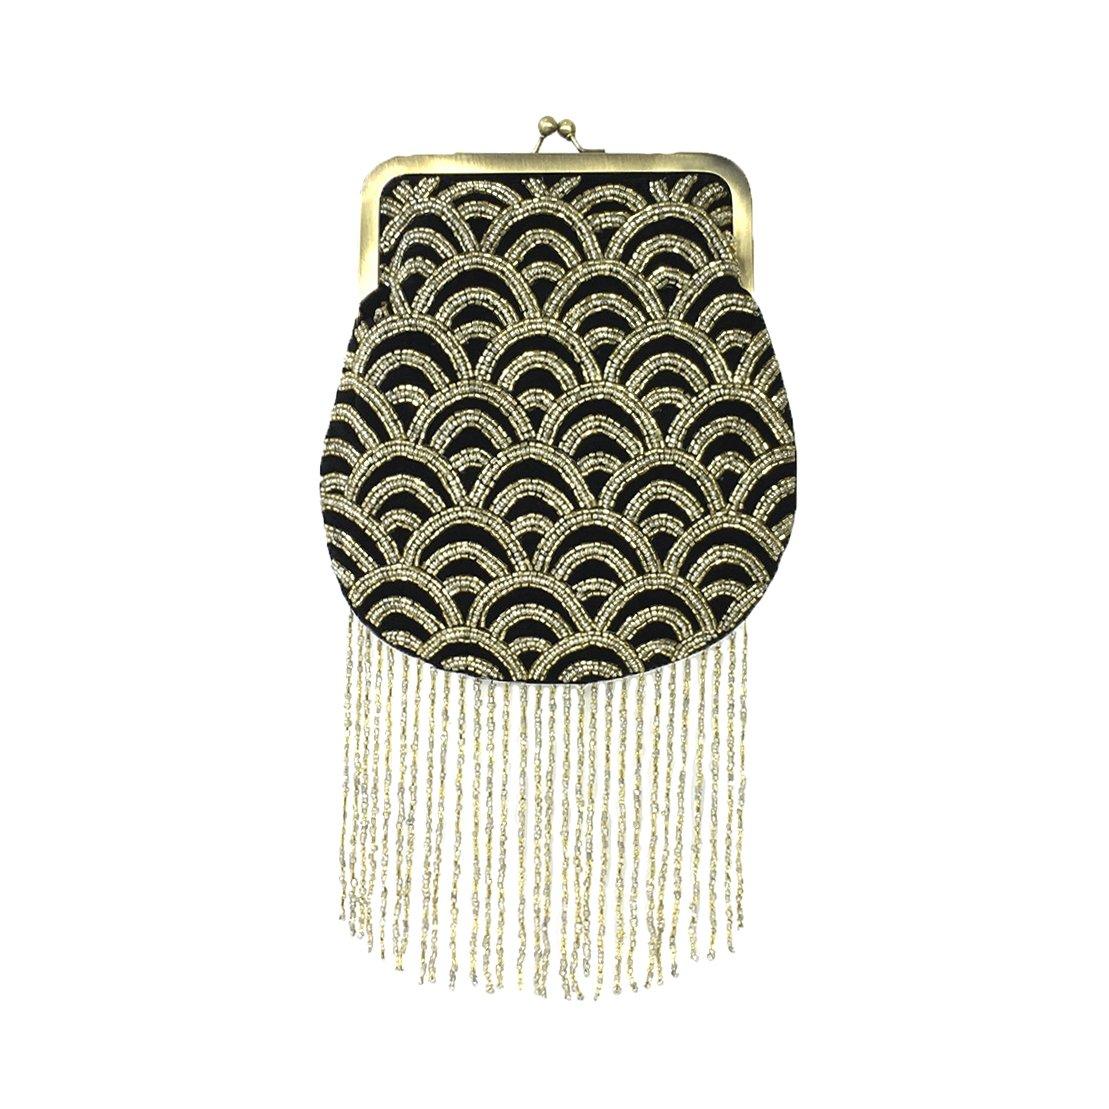 From St Xavier Sienna Kiss Lock Clutch Evening Bag, Black/Gold